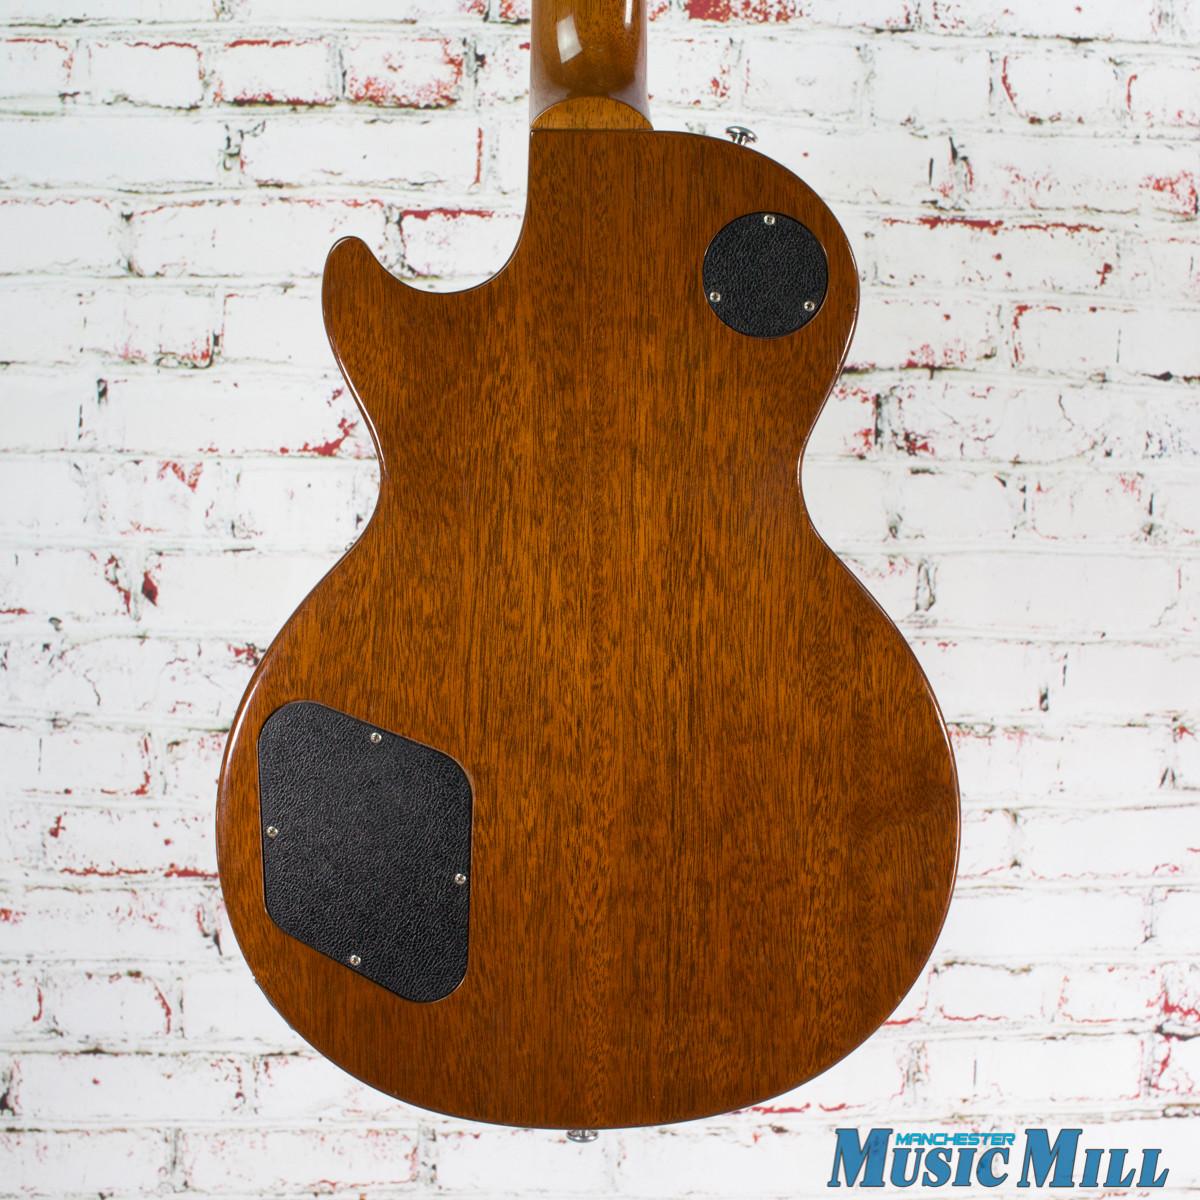 2016 Gibson Les Paul Traditional Electric Guitar Lemon Burst